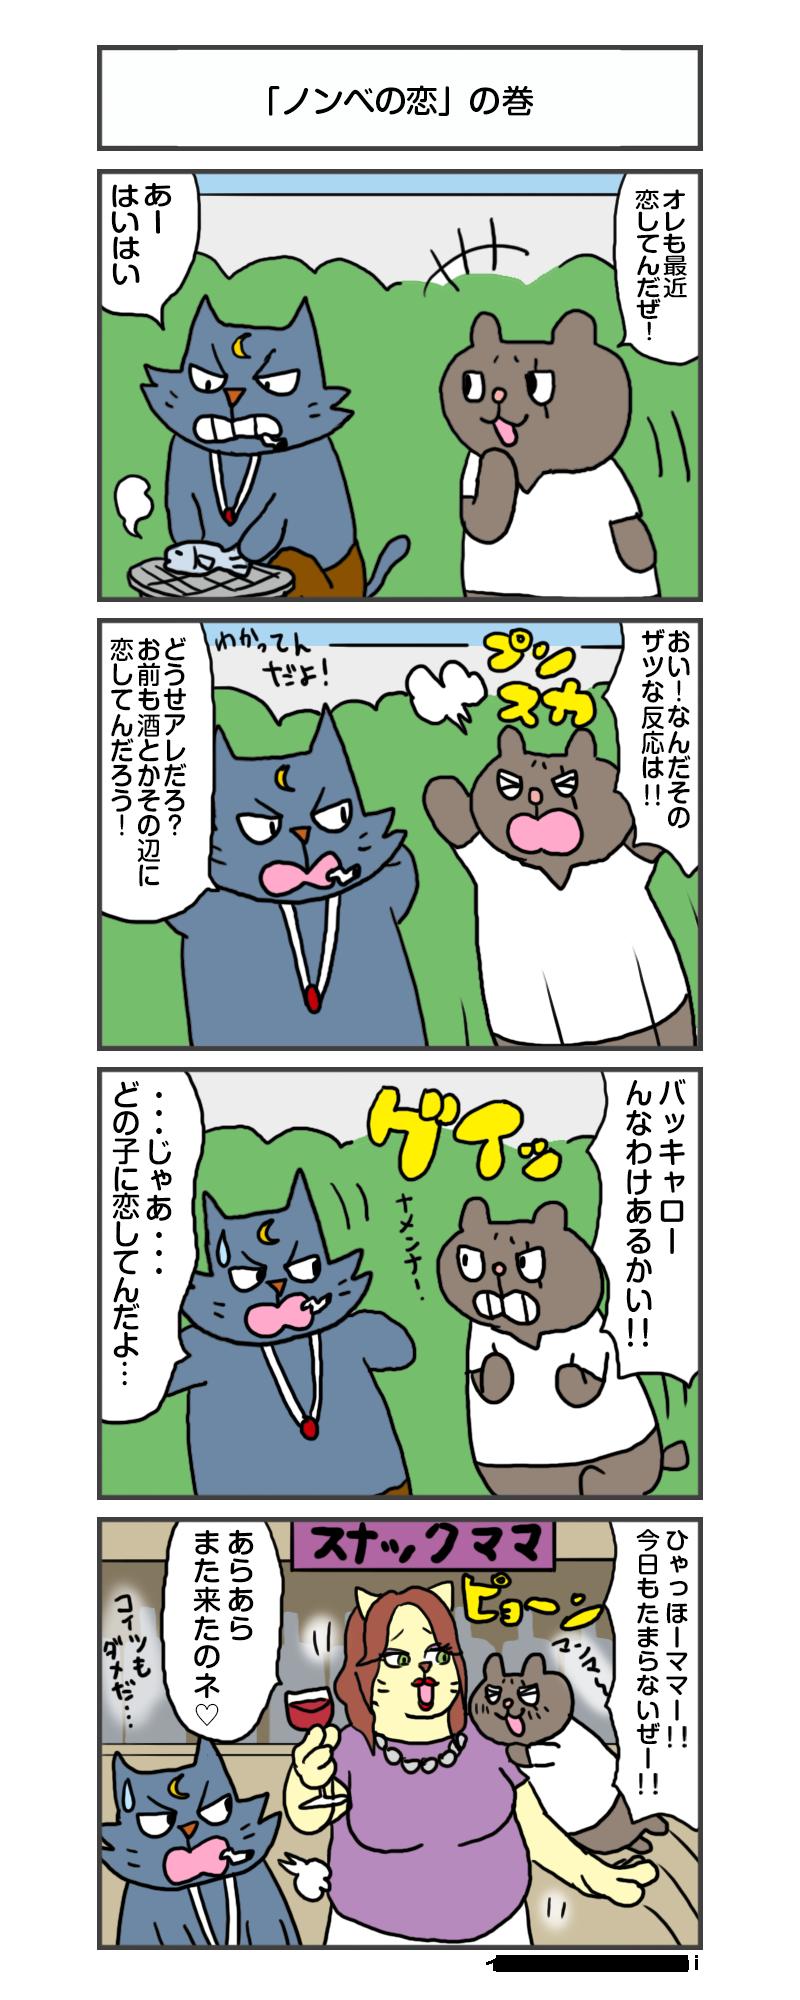 manga_vol.249